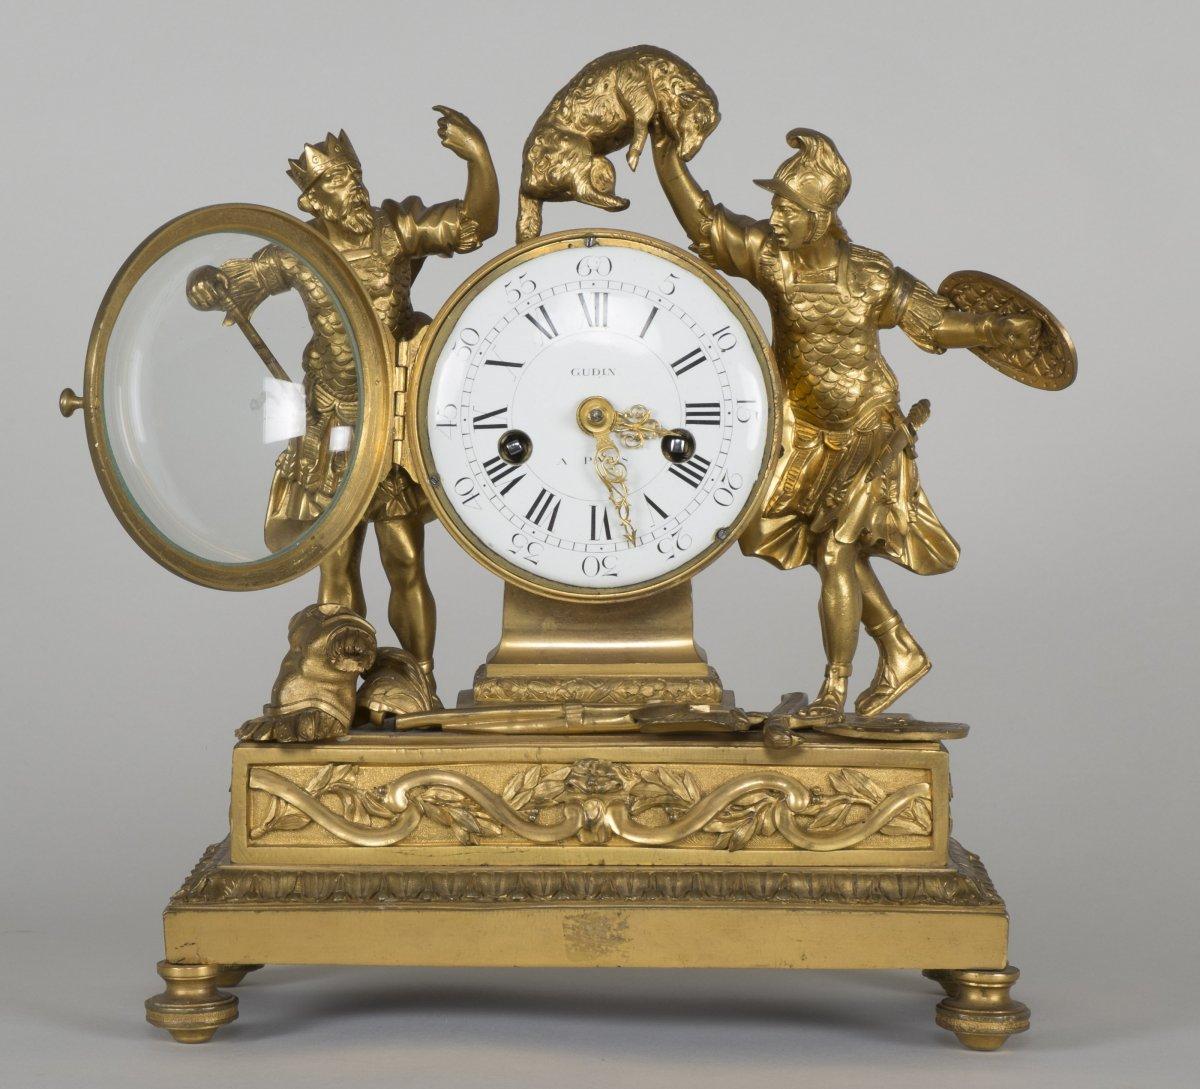 Pendule d 39 poque louis xv sign e gudin paris xviiie si cle - Galerie gilles linossier ...